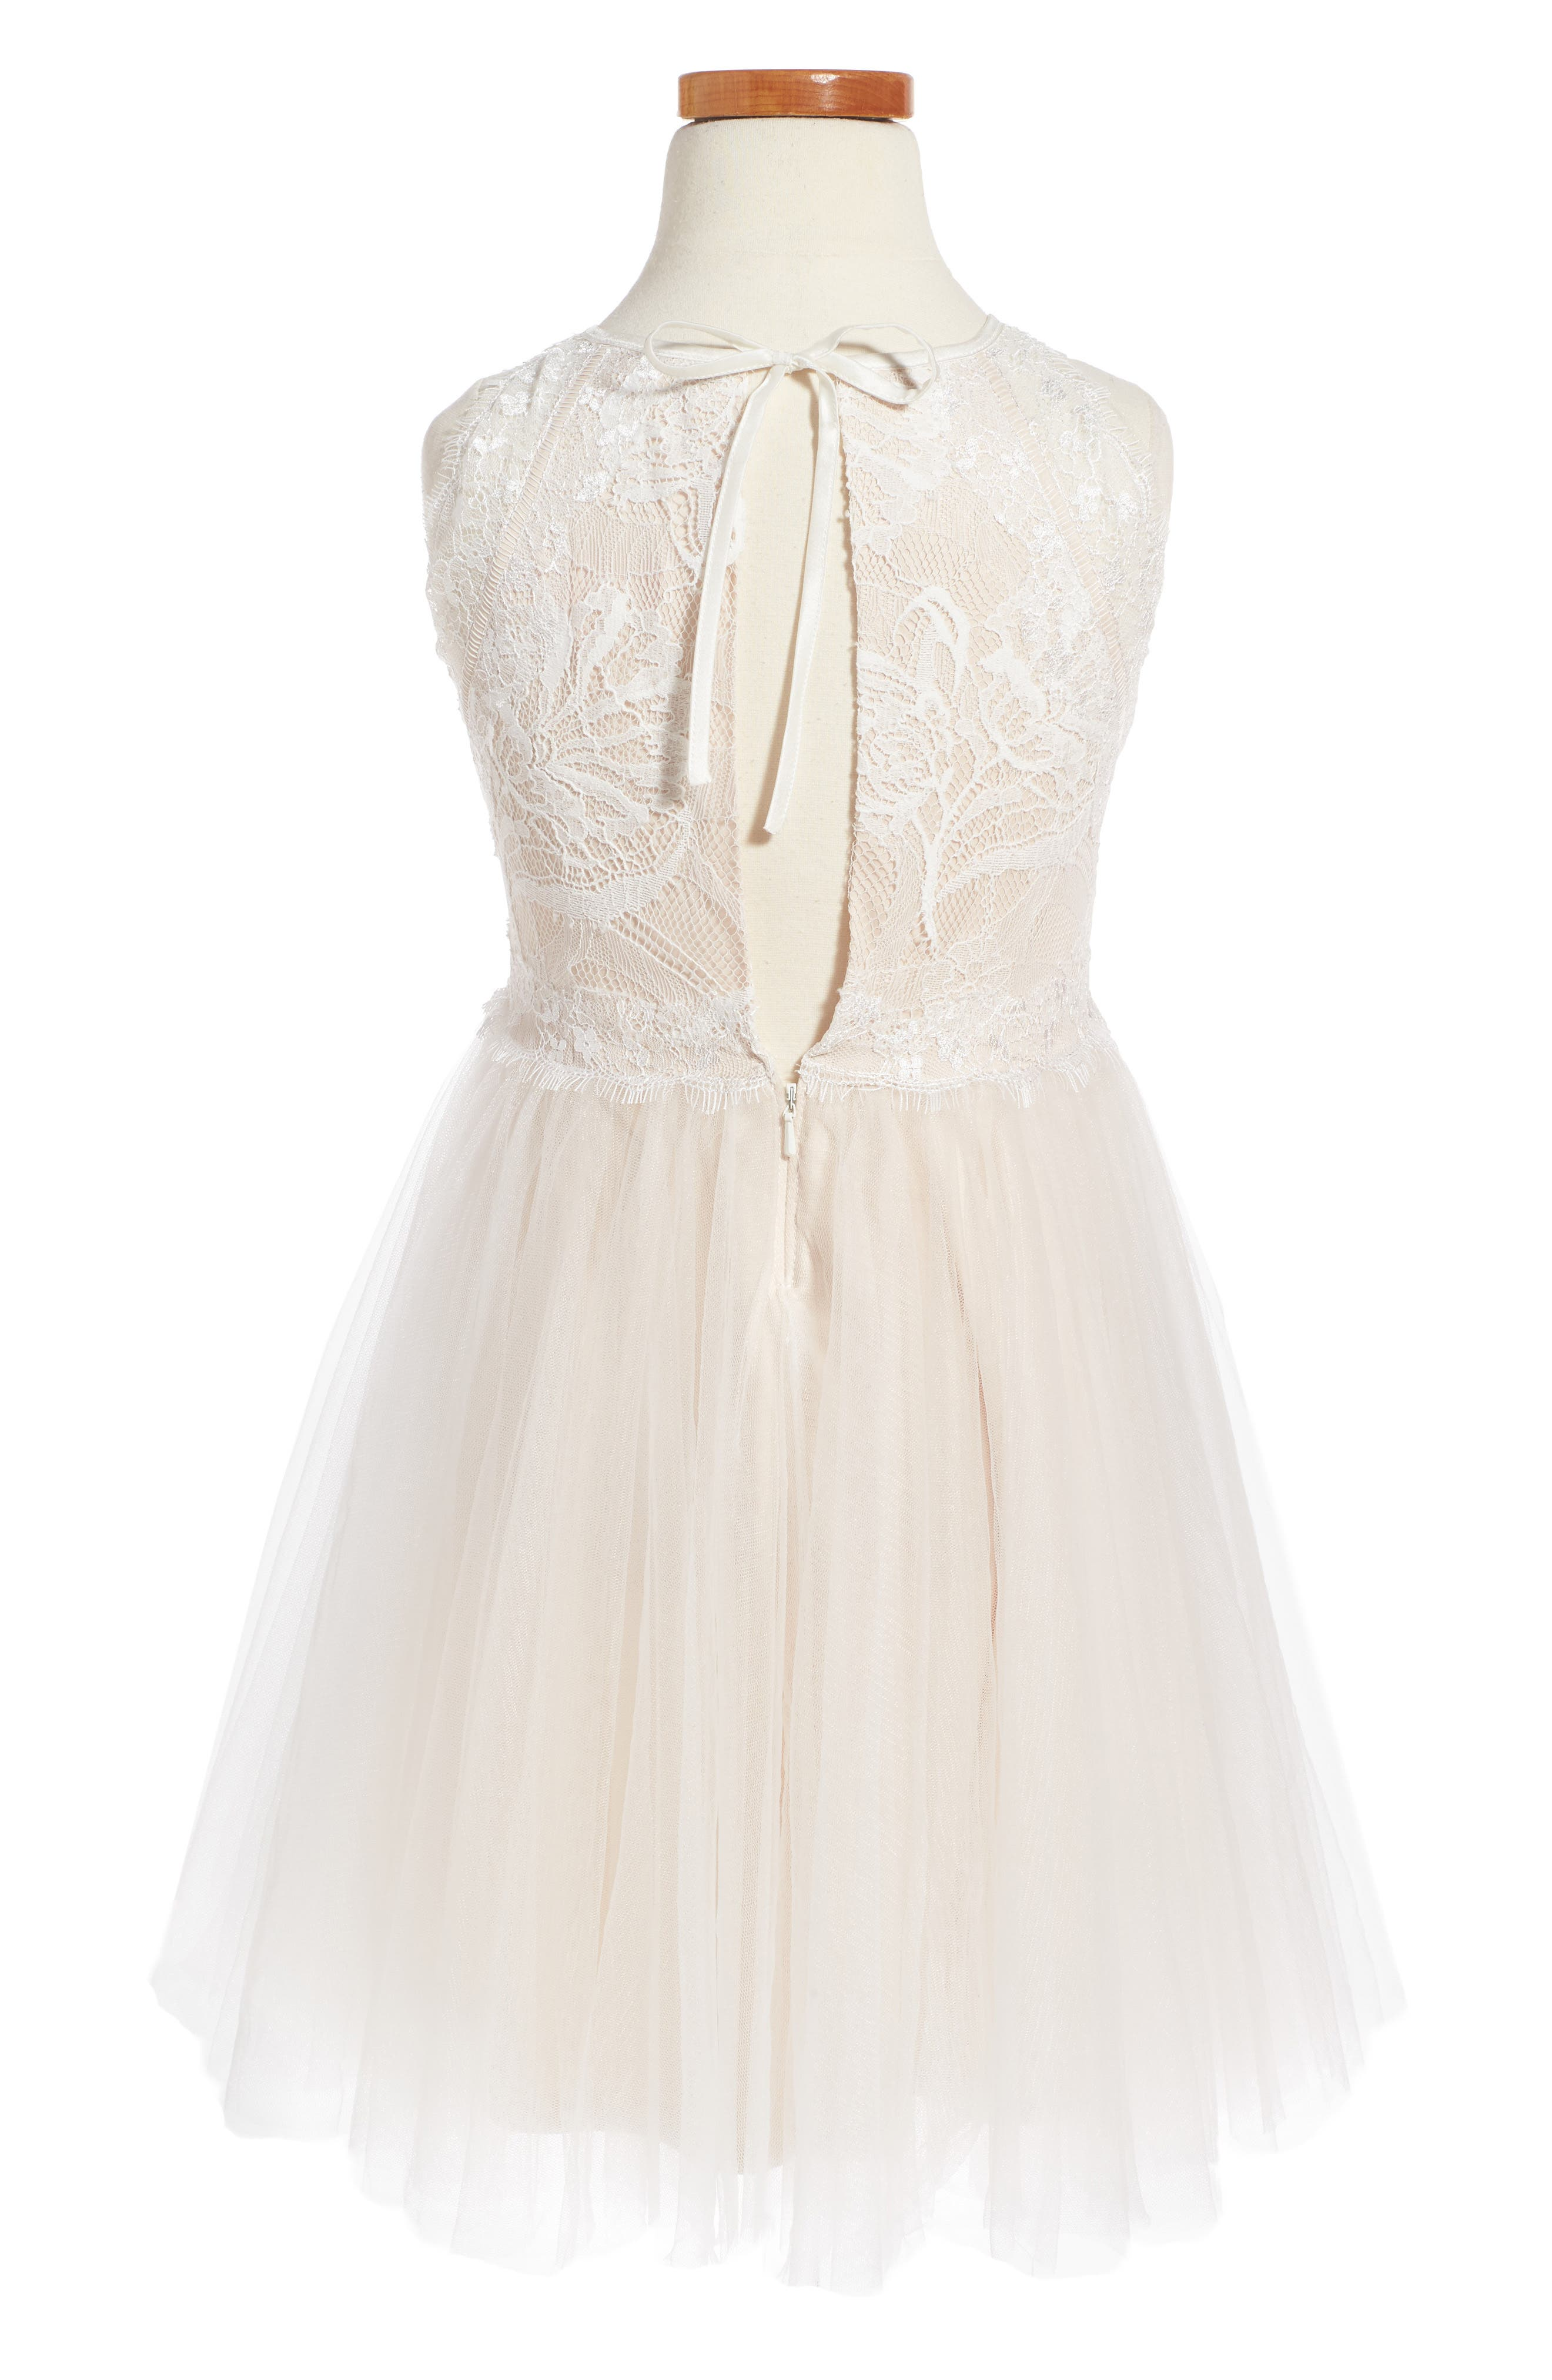 Sleeveless Lace Dress,                             Alternate thumbnail 2, color,                             900